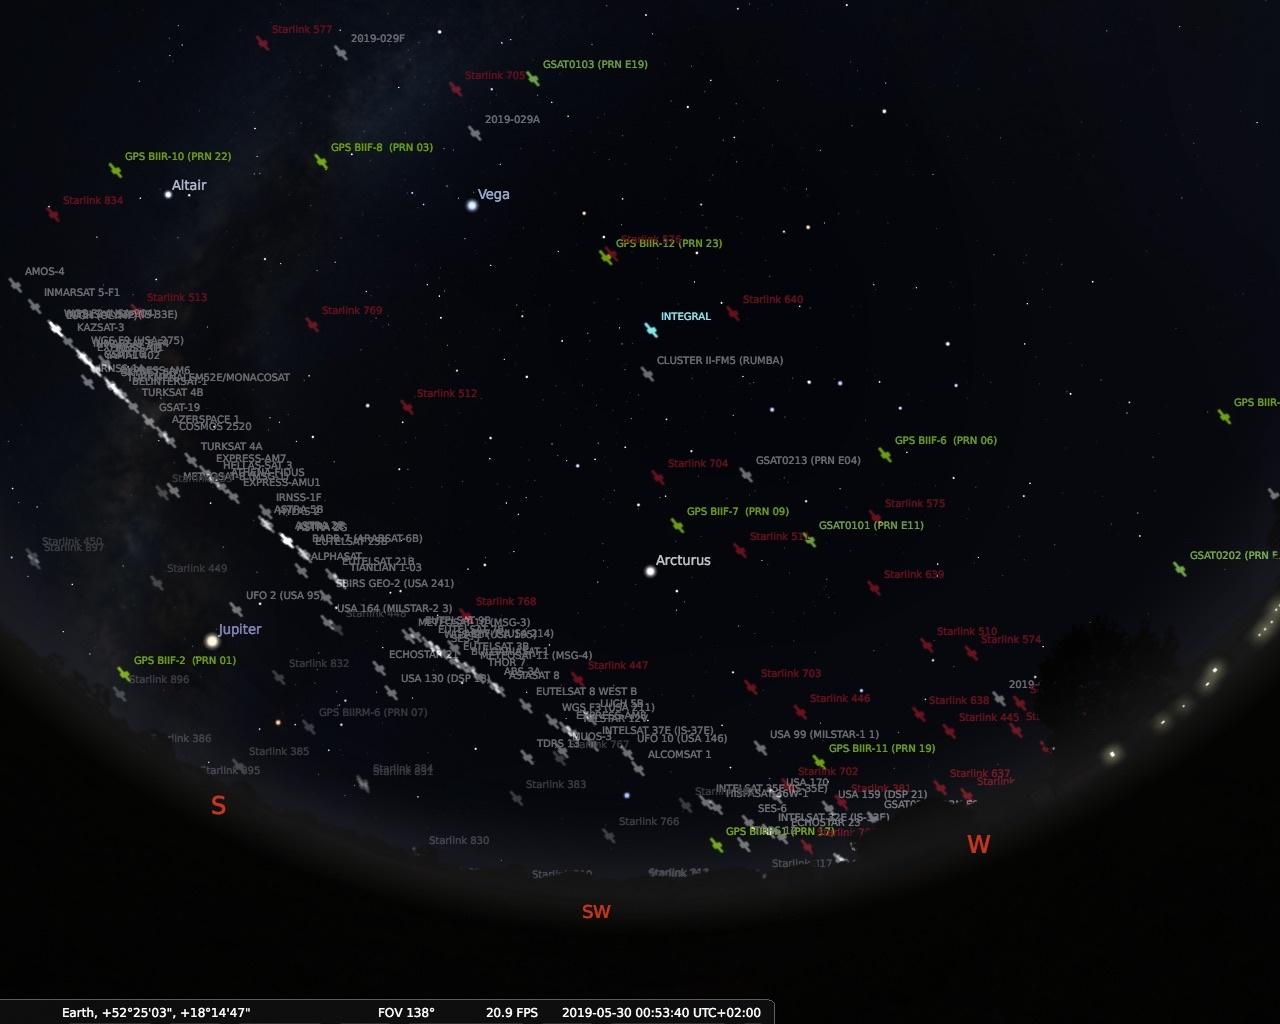 stellarium.jpg.67a6f3f6f5153358d51b8a0ffd2e0461.jpg